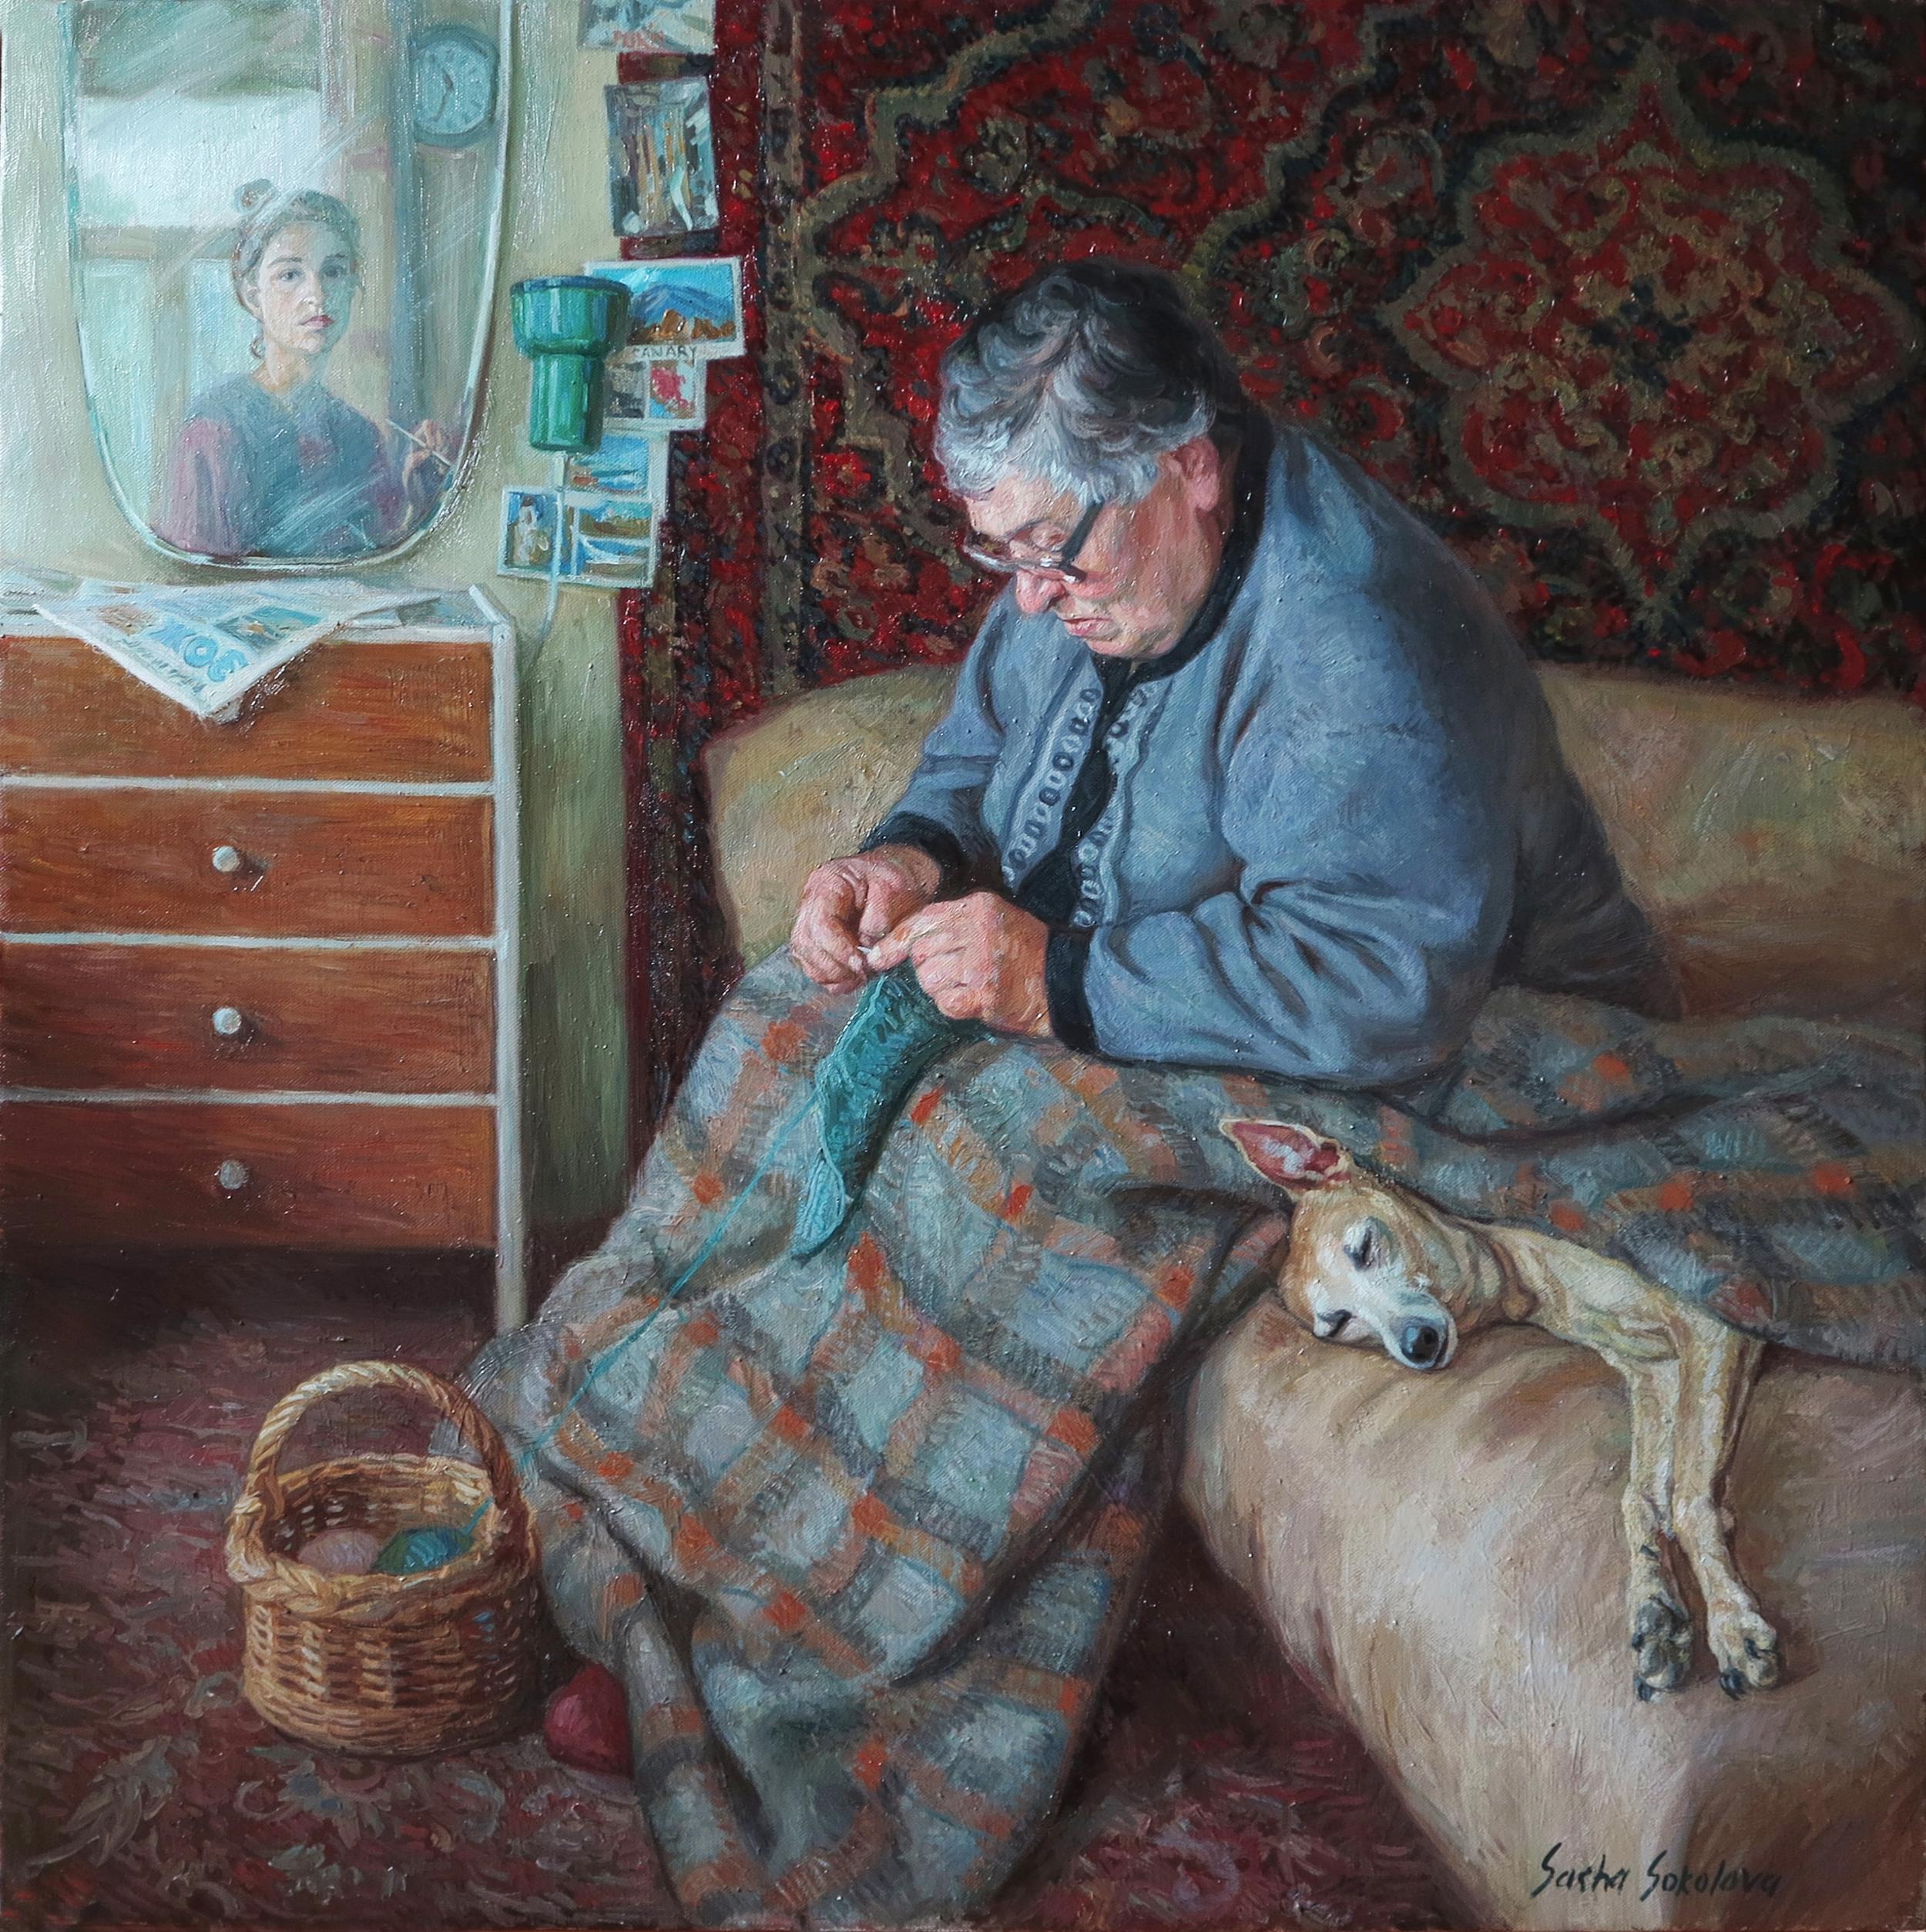 Self-portrait with grandma